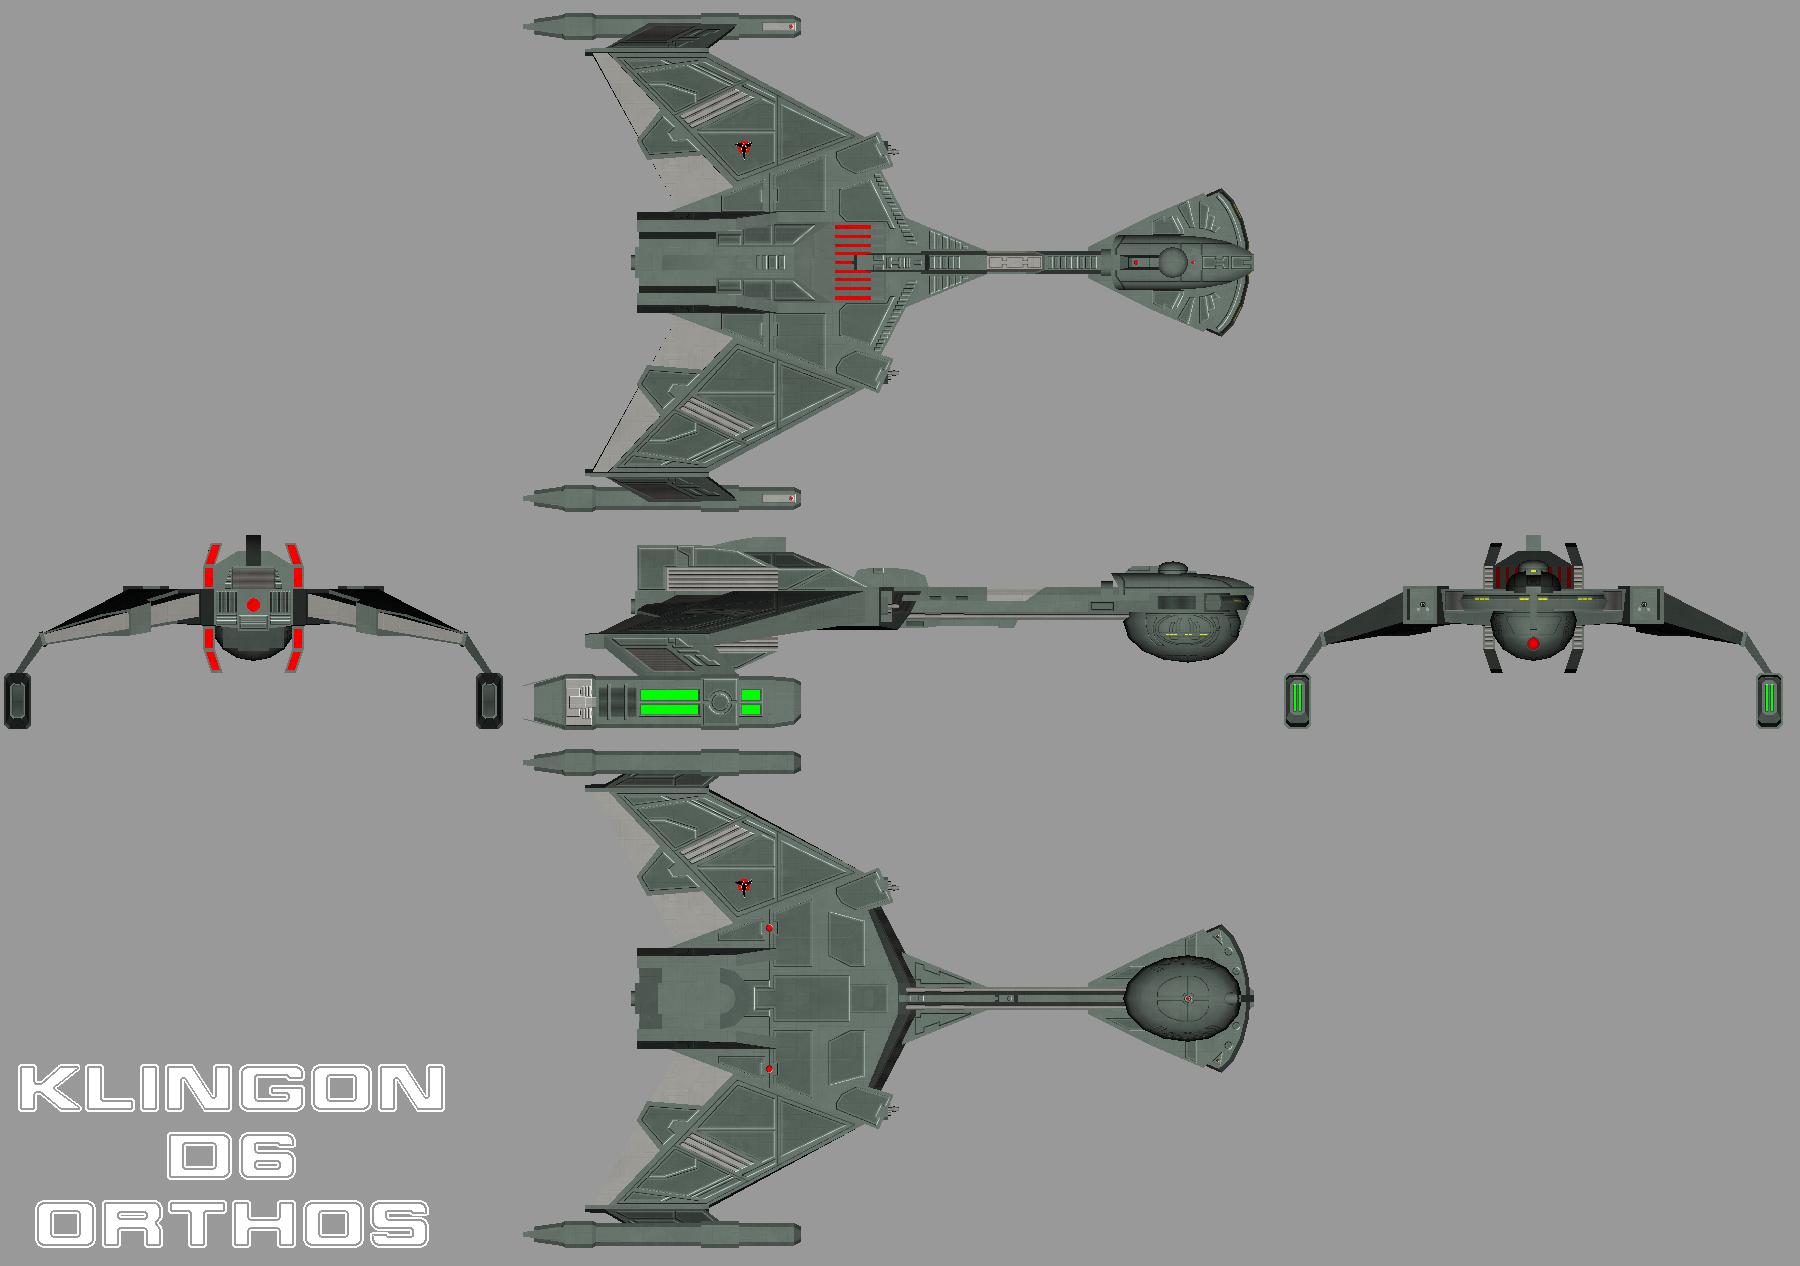 Klingon D6 Orthos By Chiletrek On Deviantart